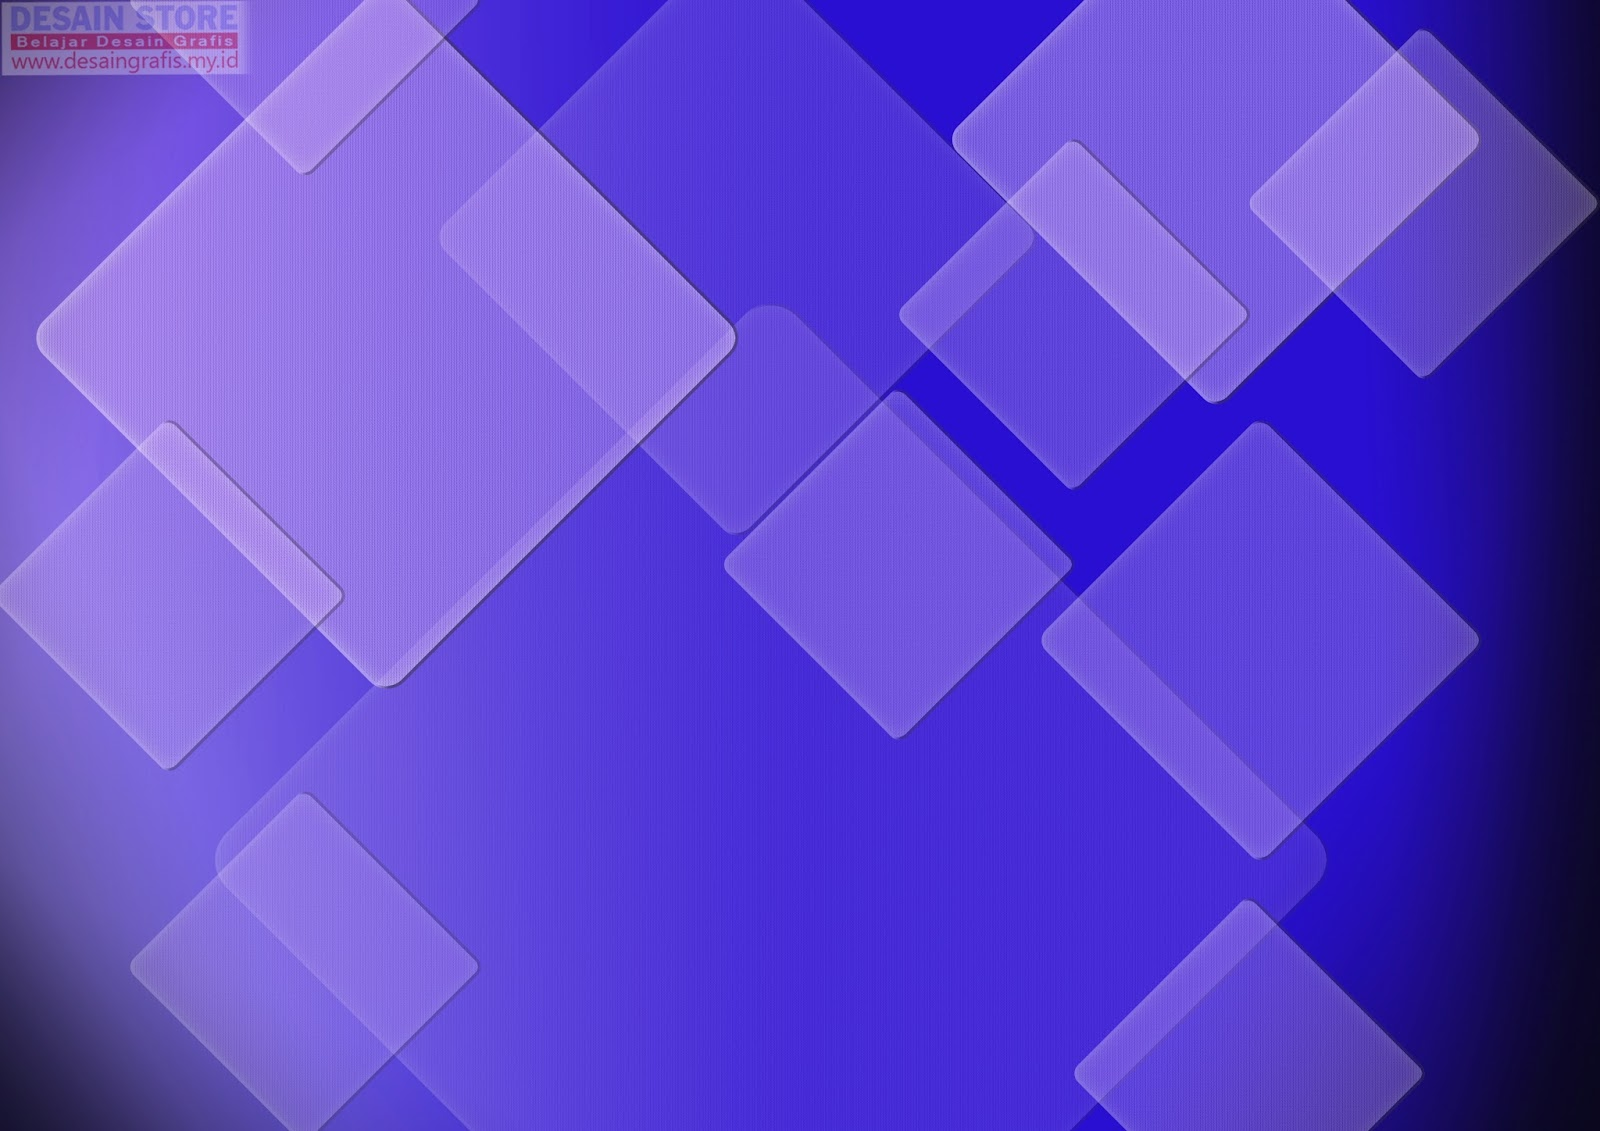 Desain Background Abstrak Vektor Full Colour Keren Store Sobat Tertarik